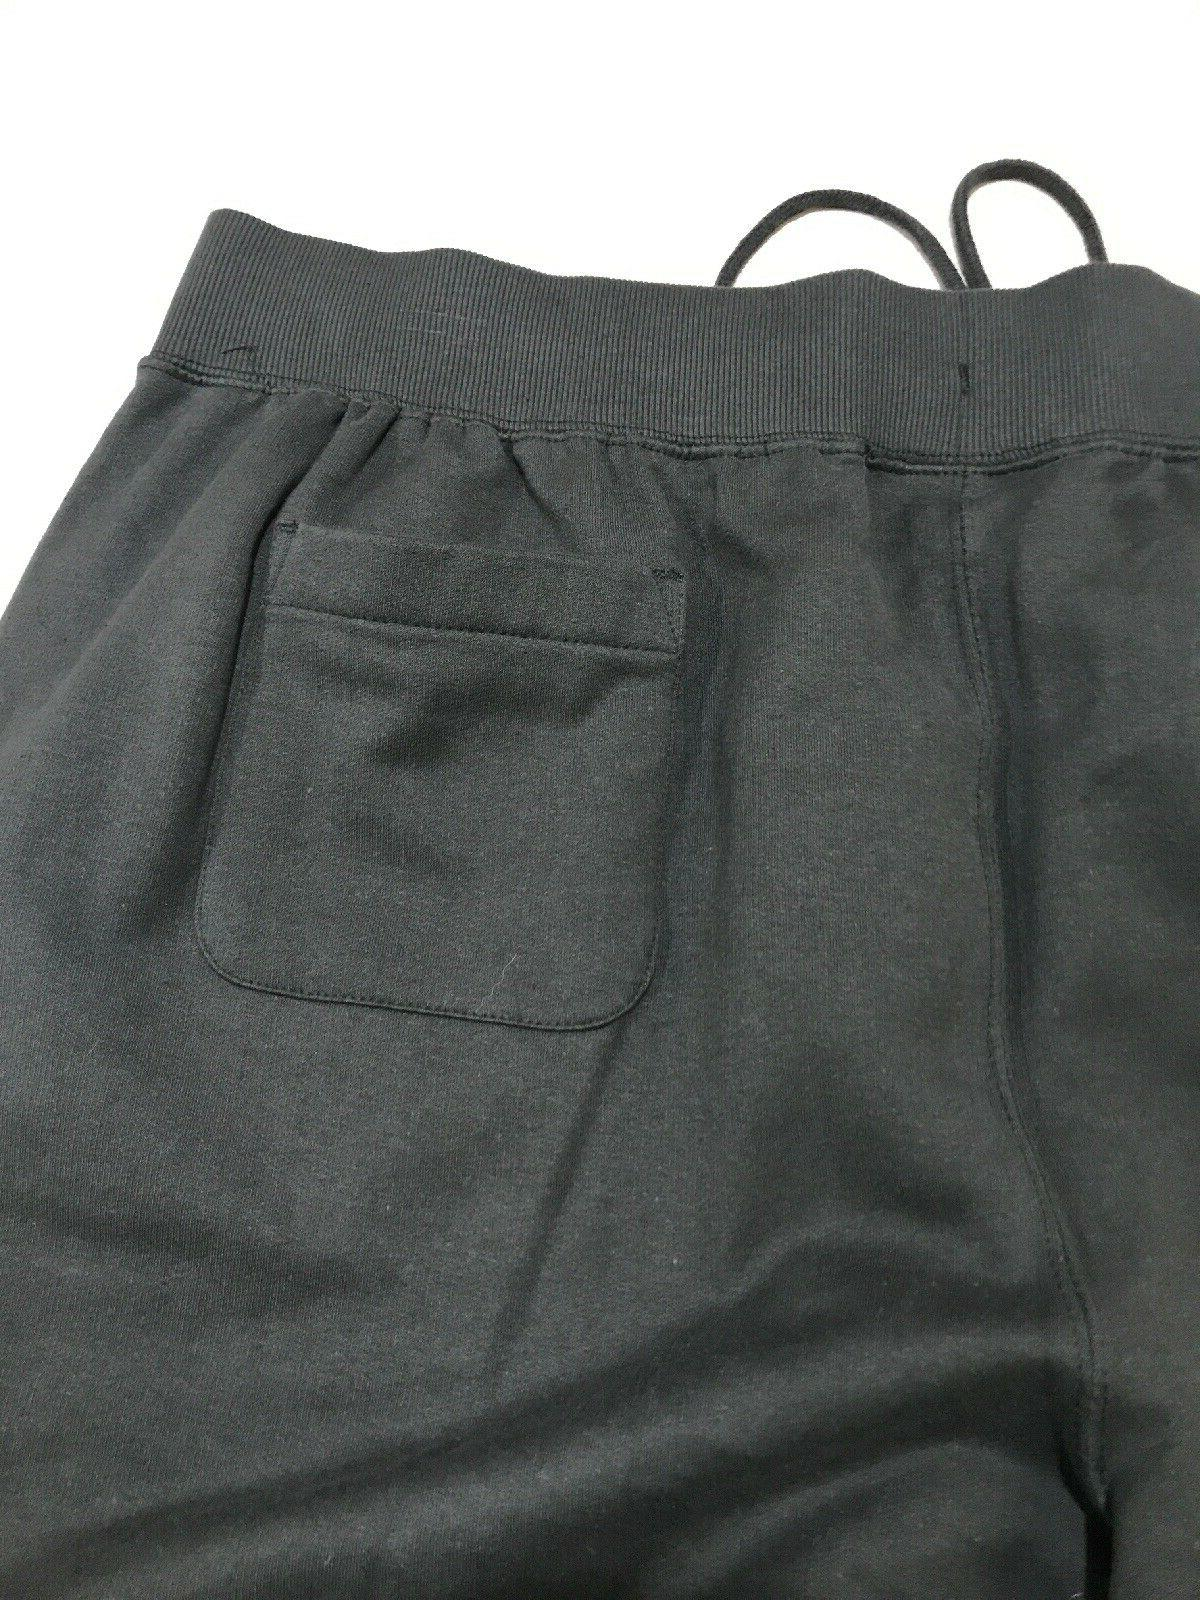 Champion Mens Big Tall Pants Green Jogger Sweatpants 4XL